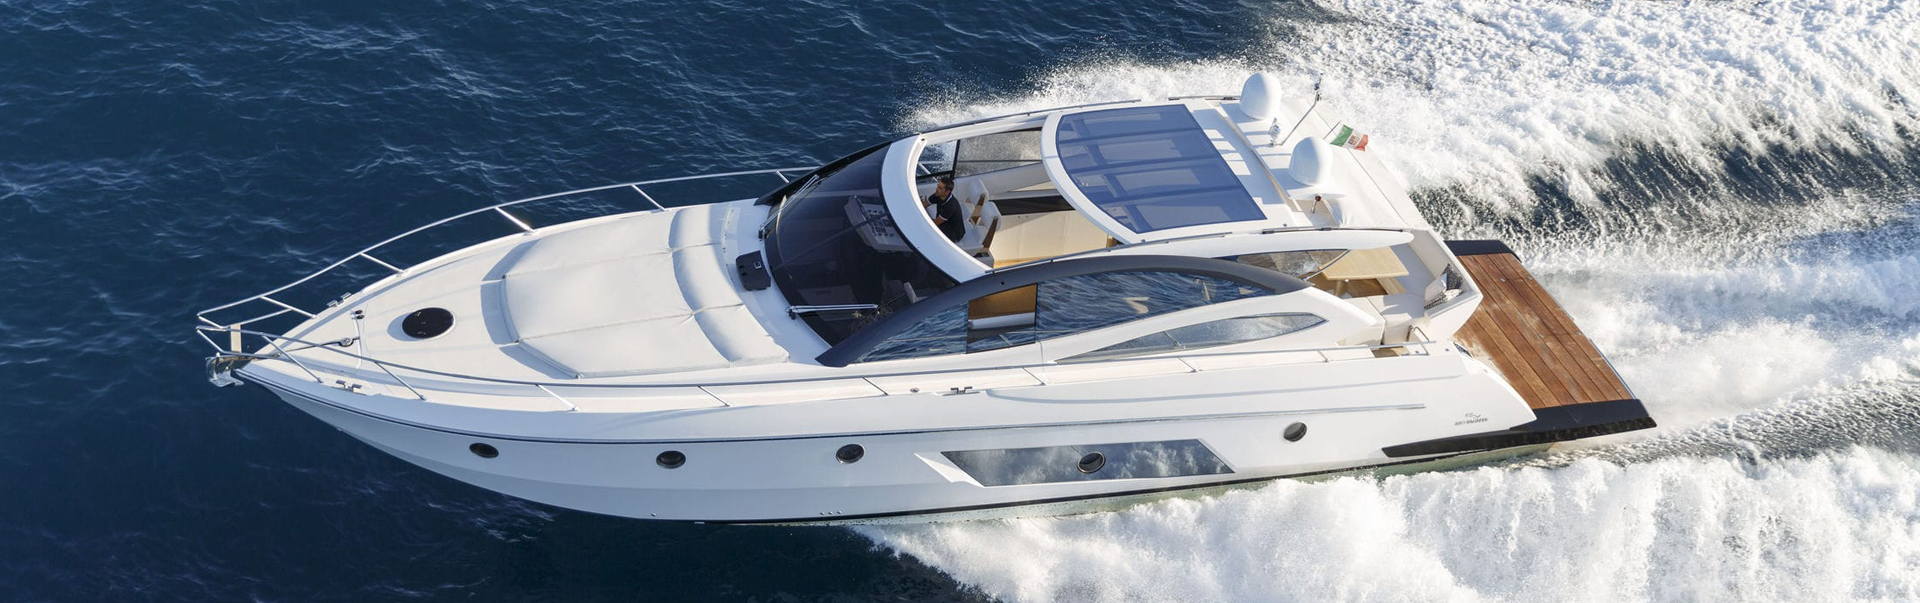 slide-yacht